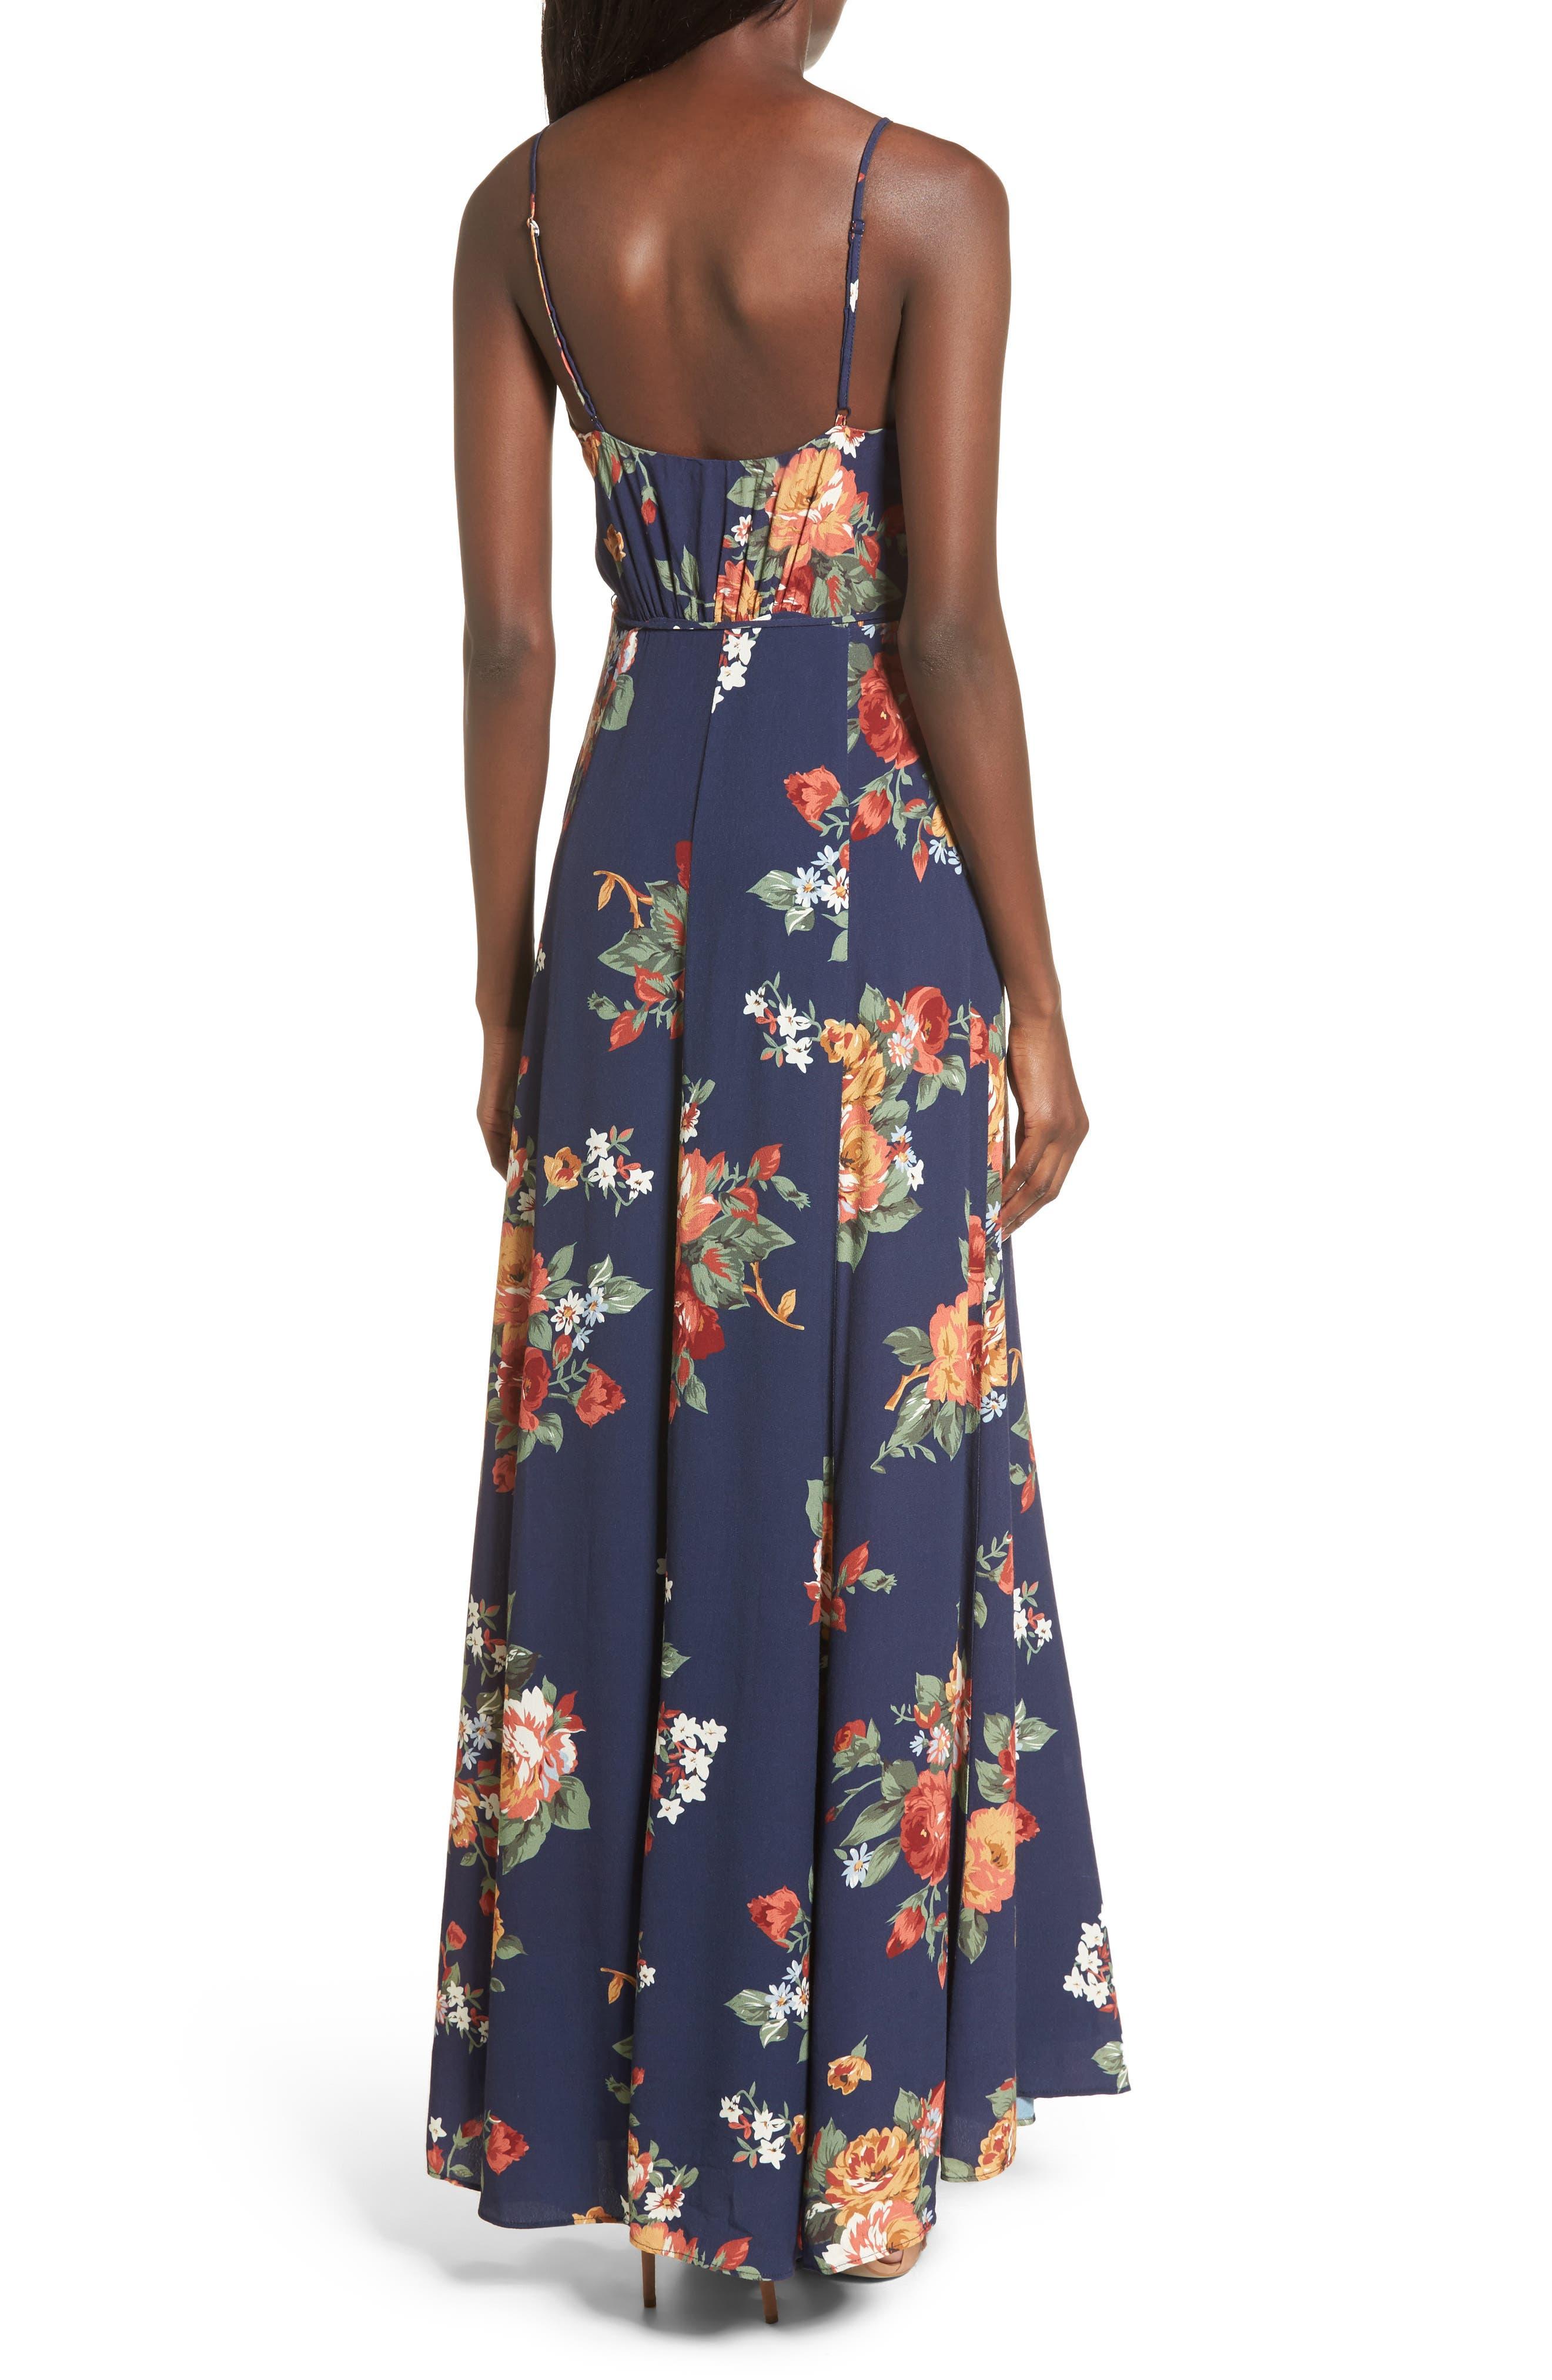 Crenshaw Maxi Dress,                             Alternate thumbnail 2, color,                             400